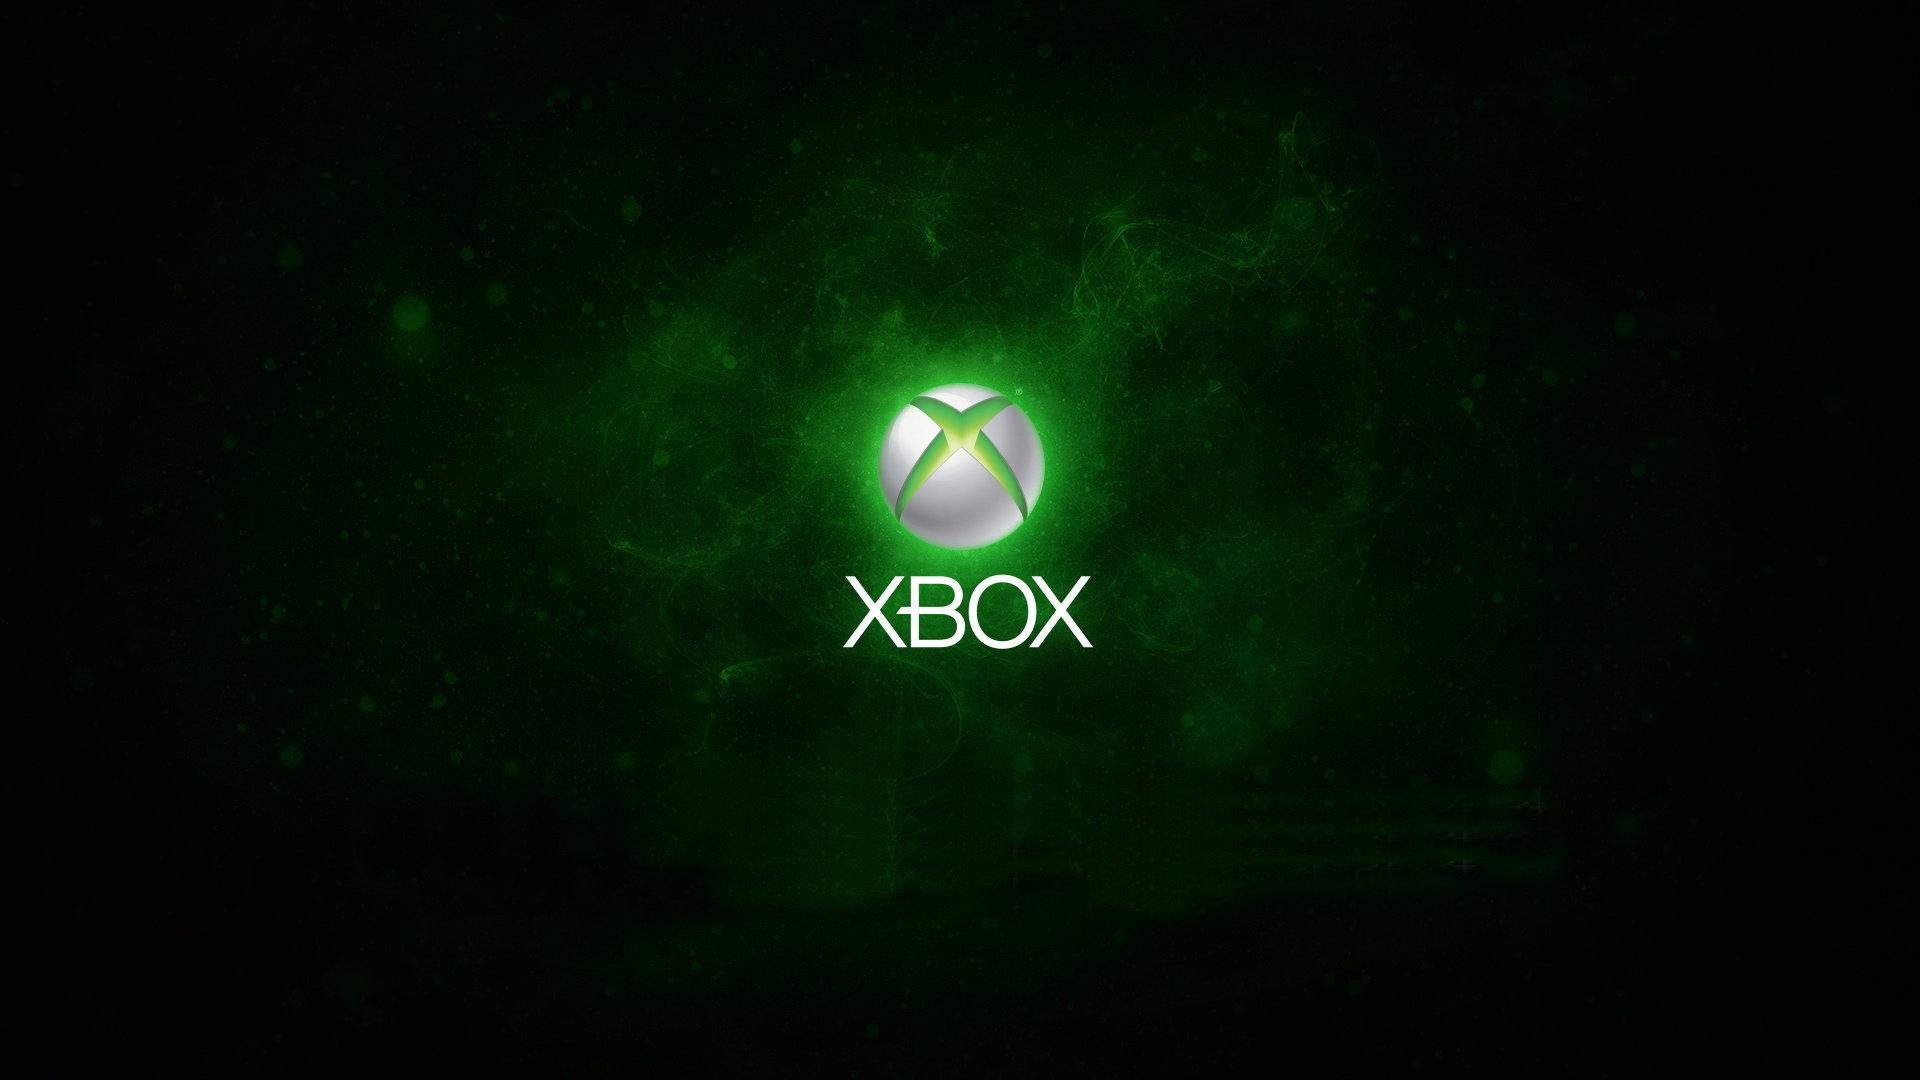 Hd Xbox One Wallpaper Wallpapersafari